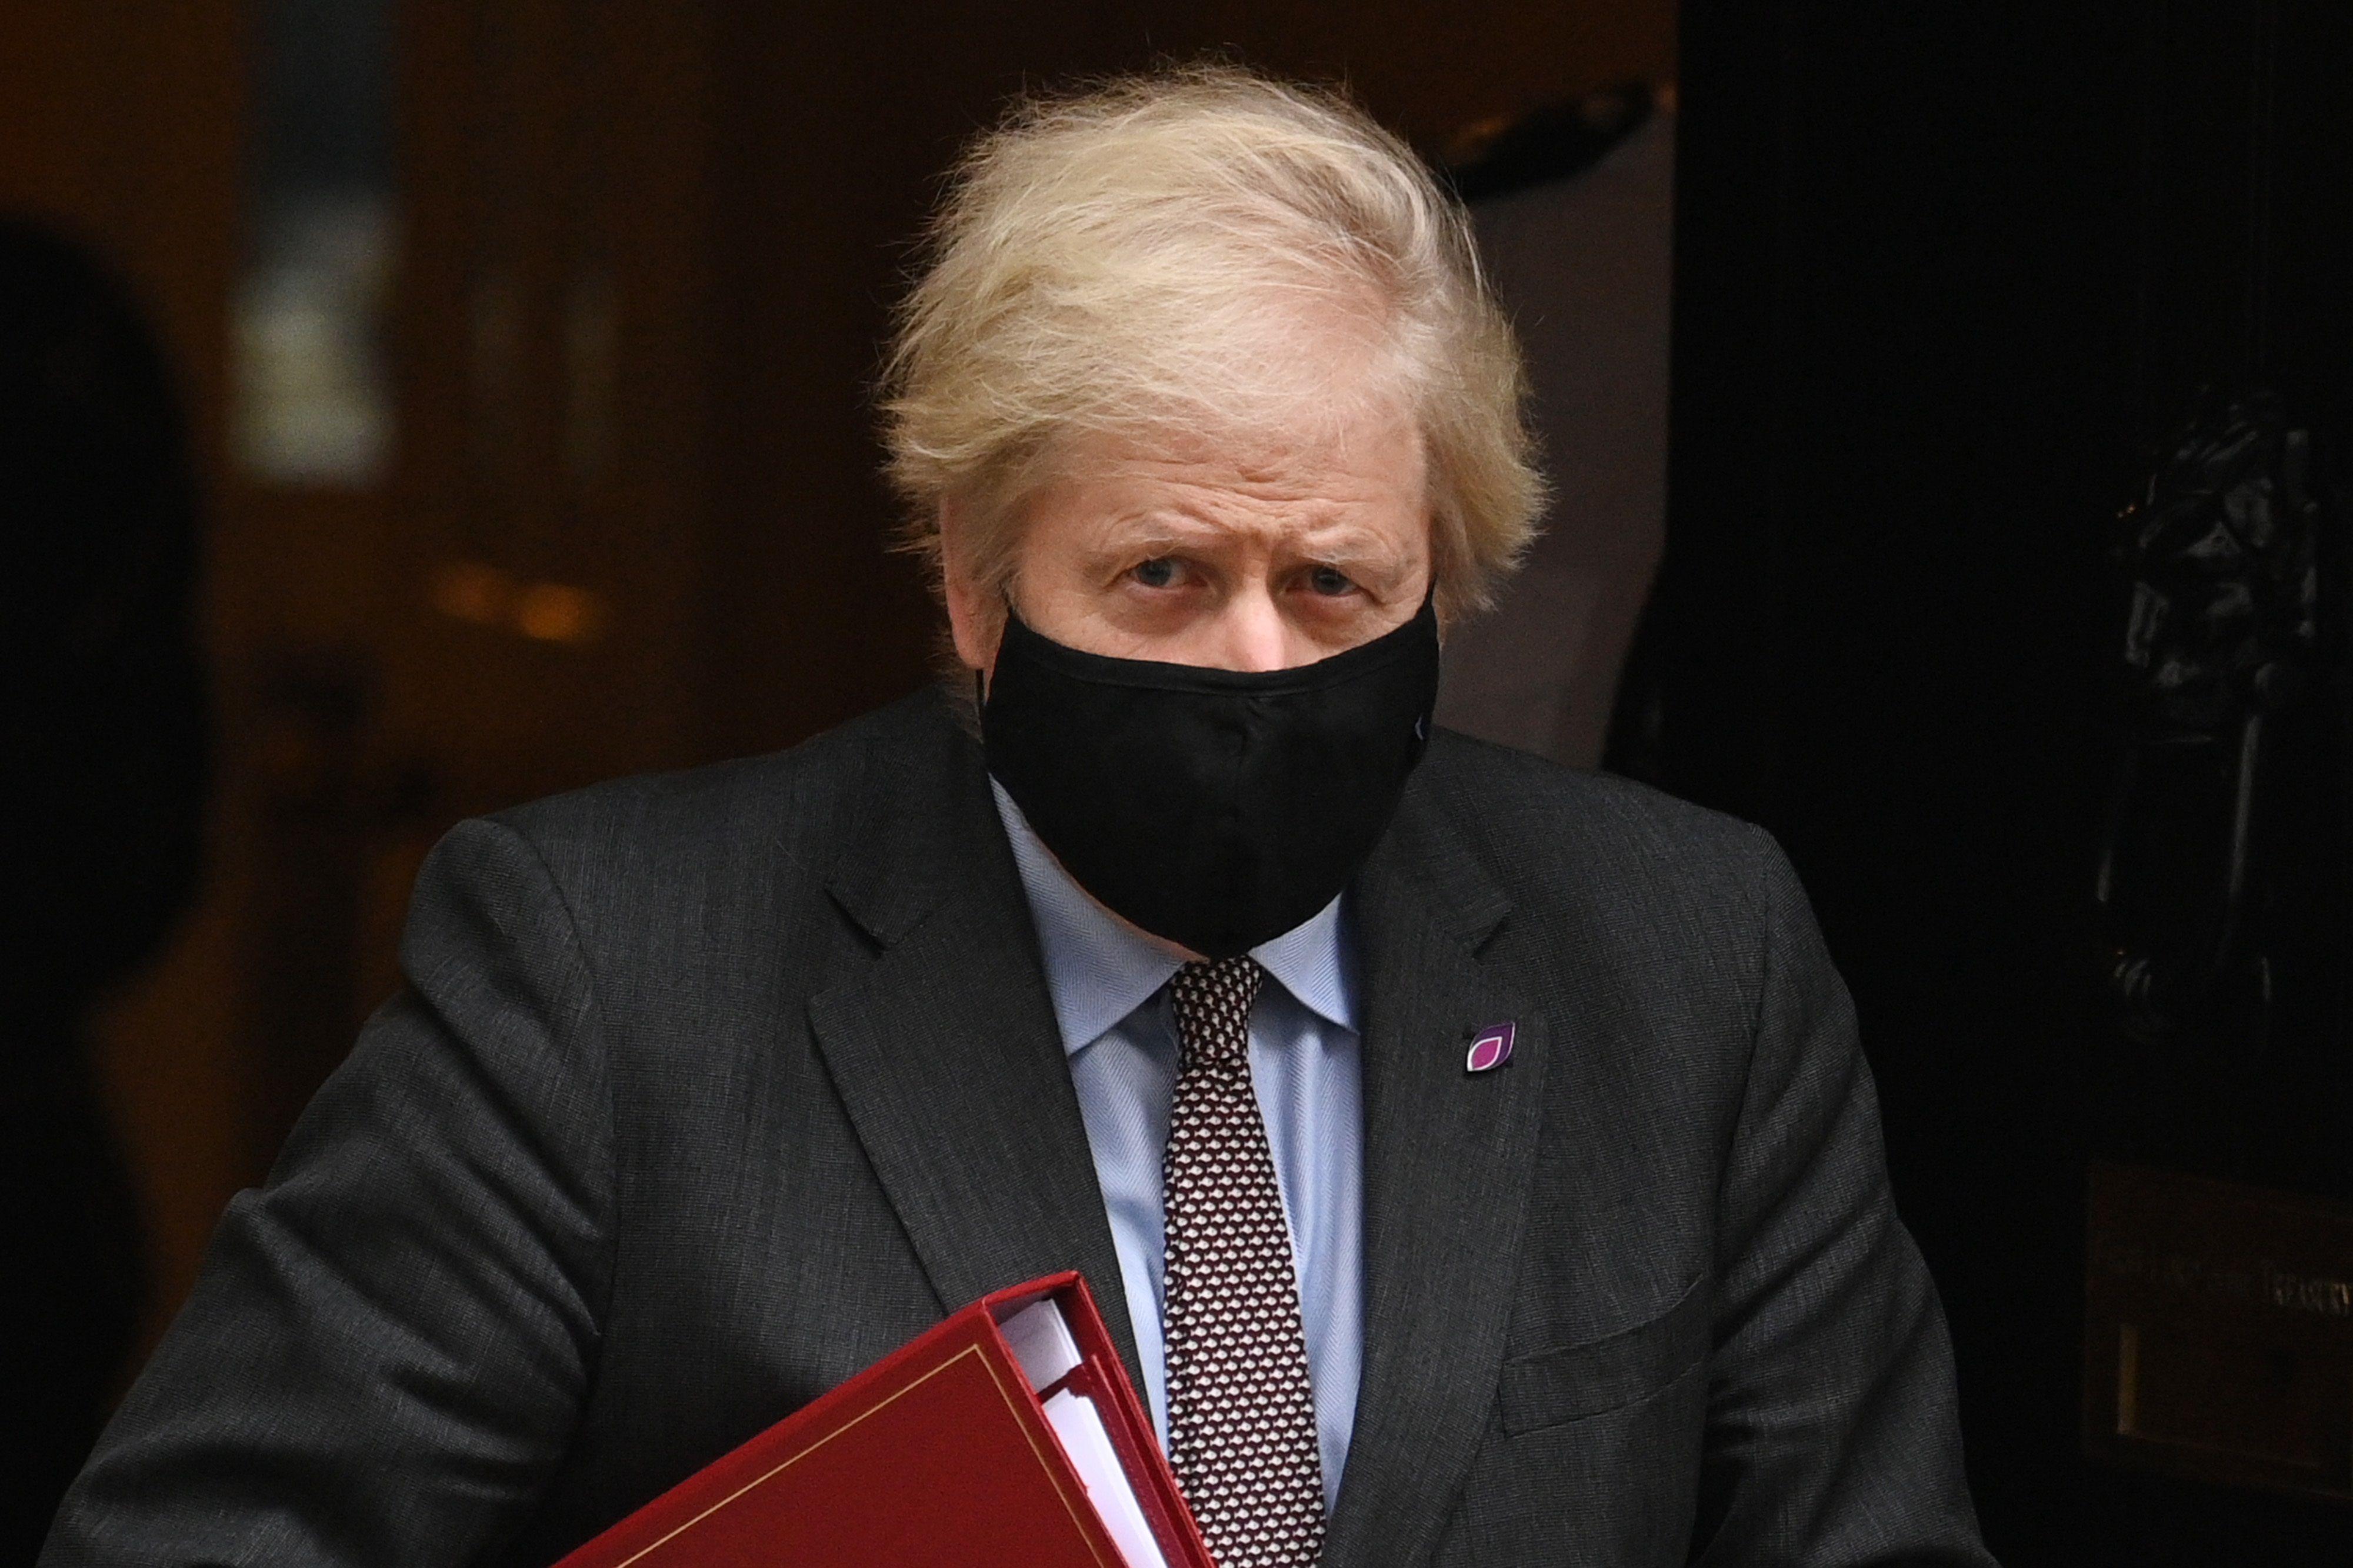 27/01/2021 Boris Johnson, primer ministro de Reino Unido POLITICA EUROPA INTERNACIONAL REINO UNIDO LEON NEAL